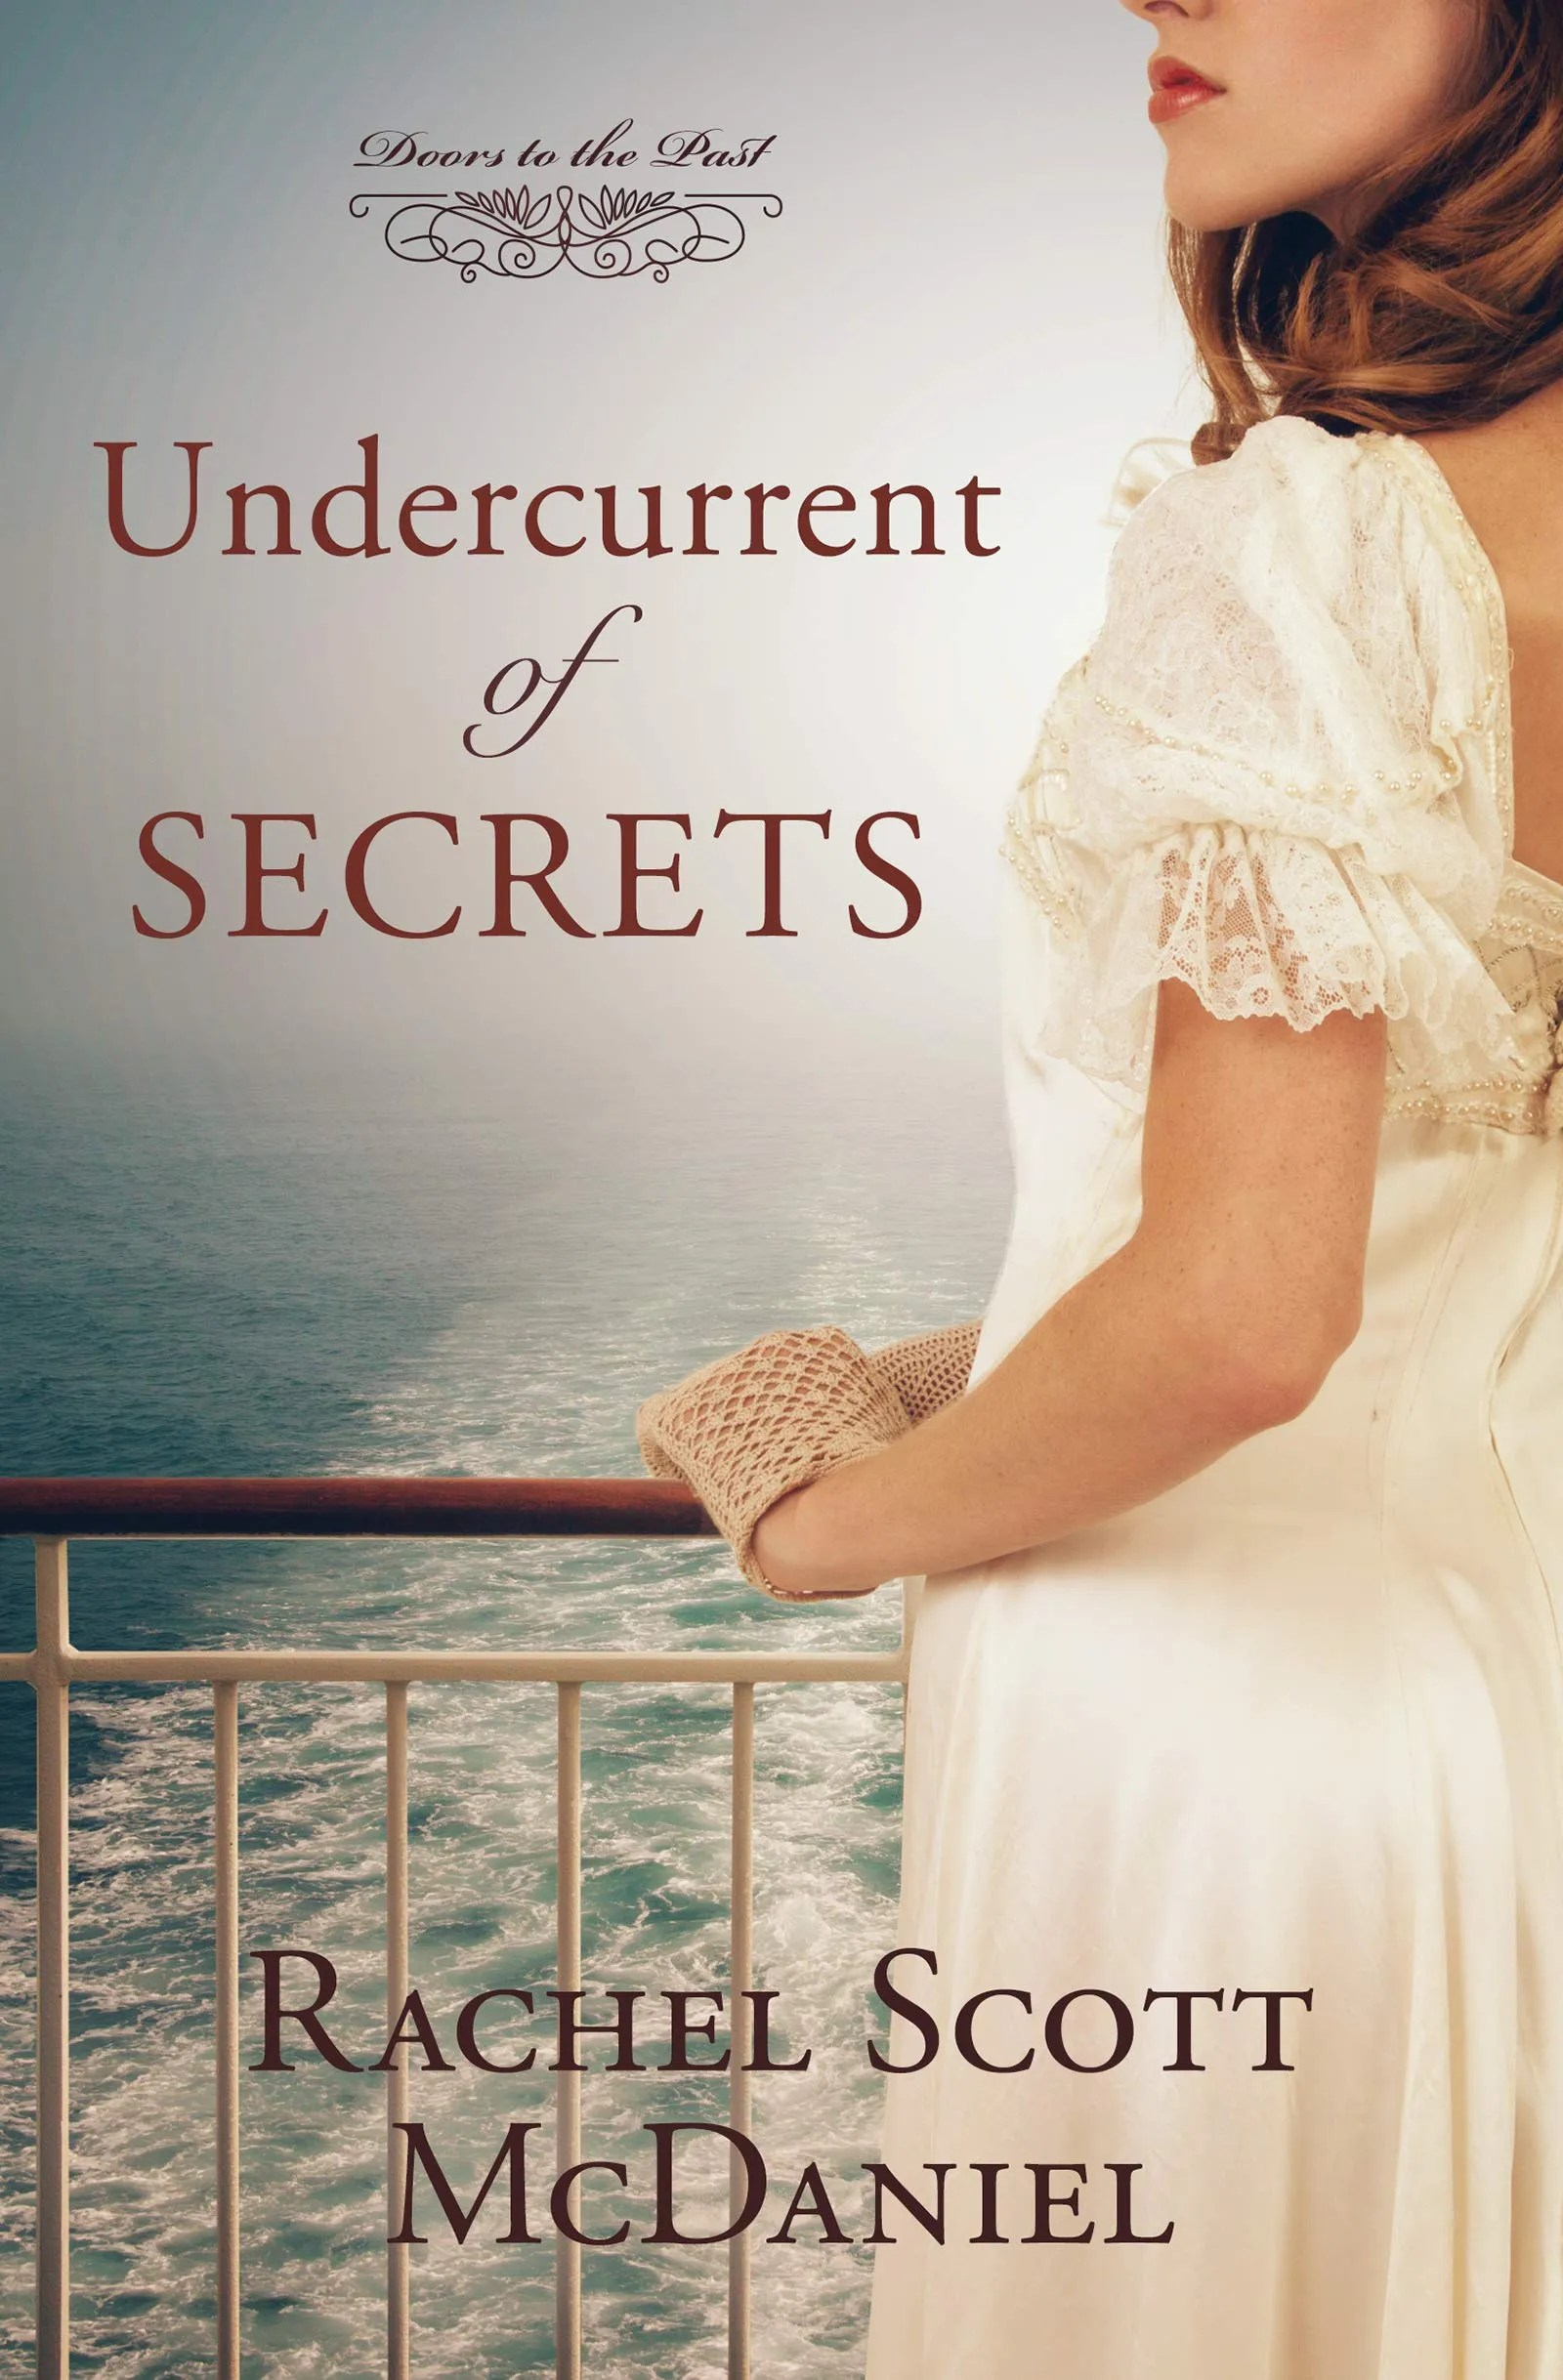 Undercurrent of Secrets